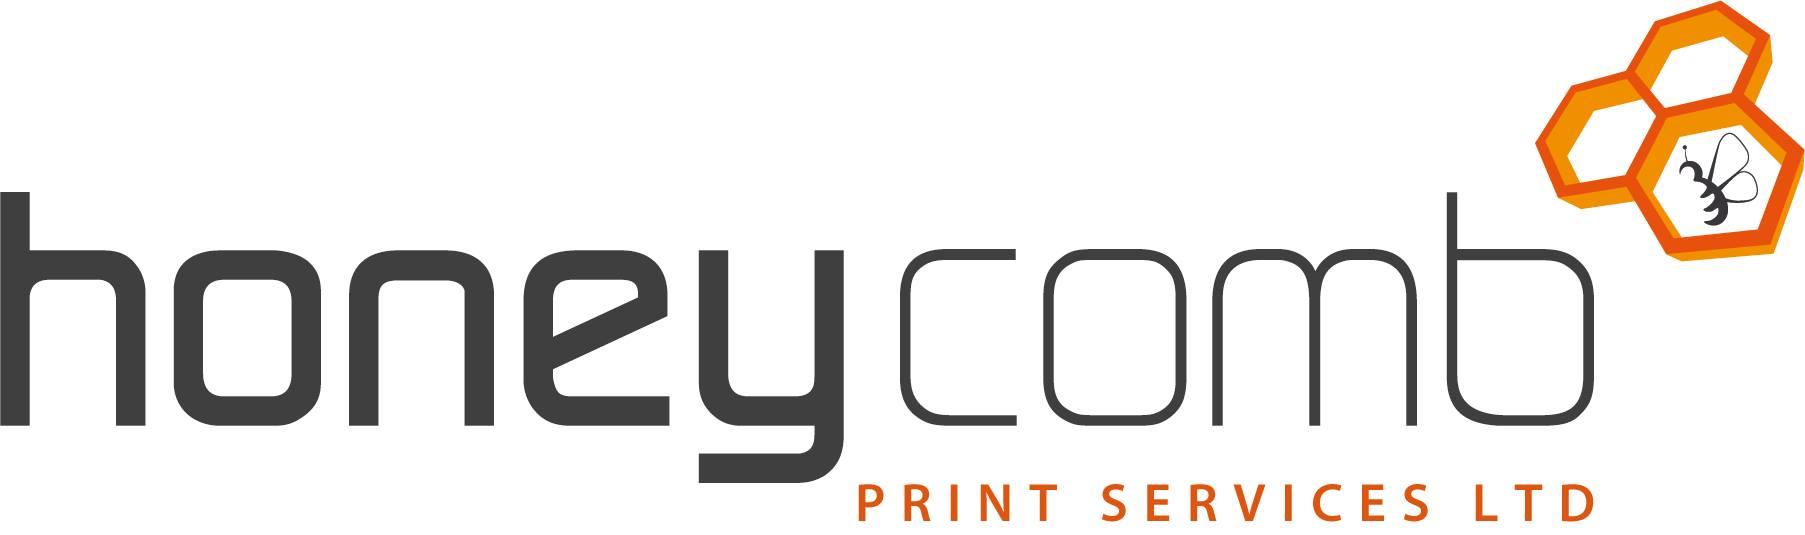 Honeycomb Print Services